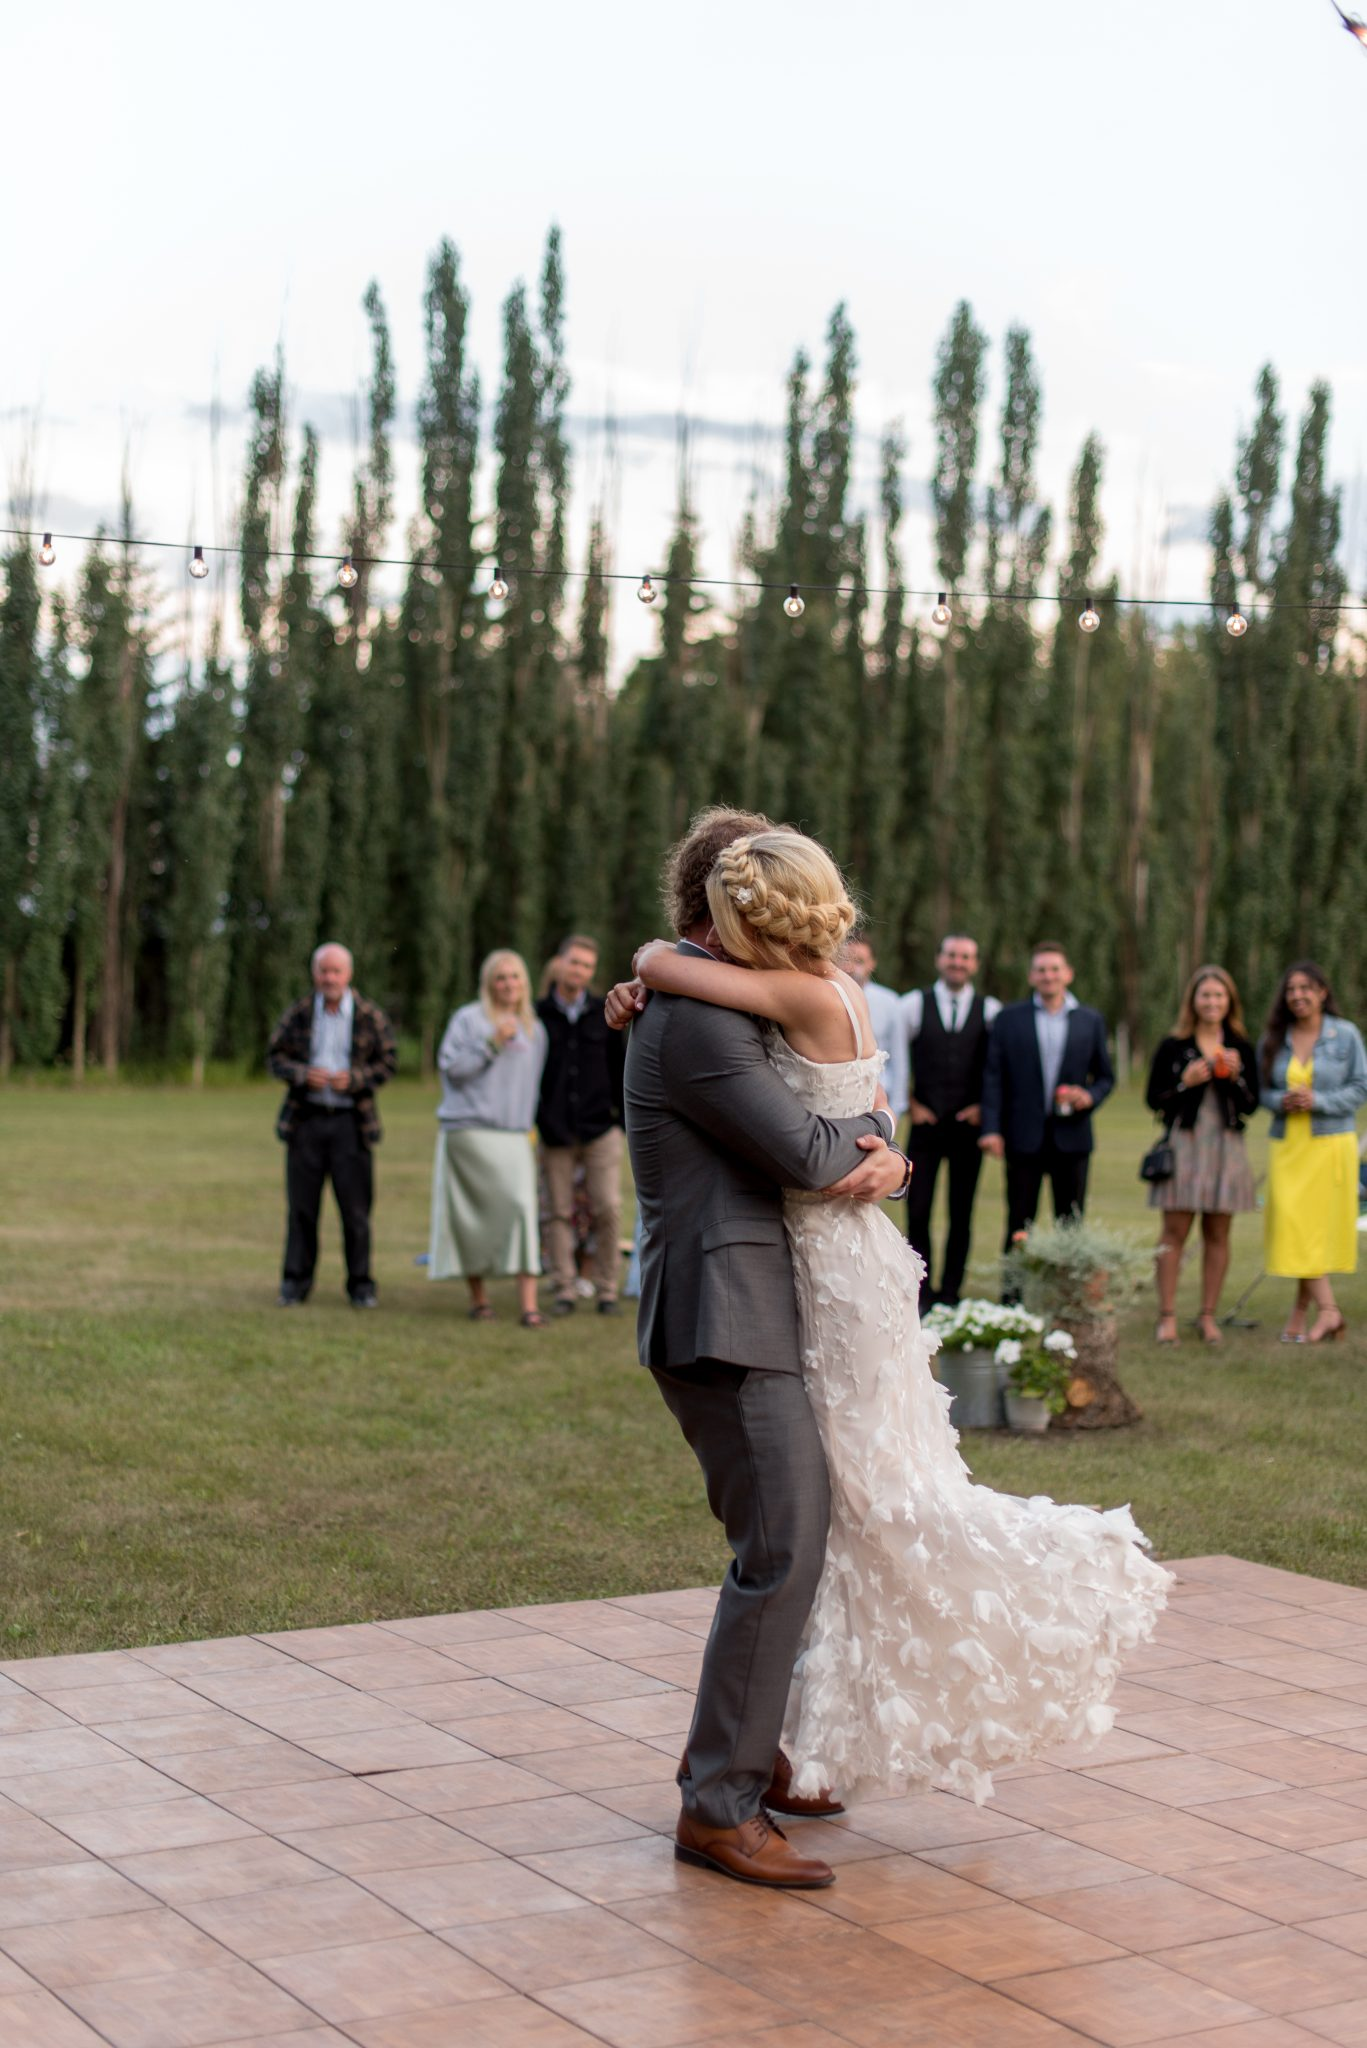 Outdoor wedding first dance on a summer day